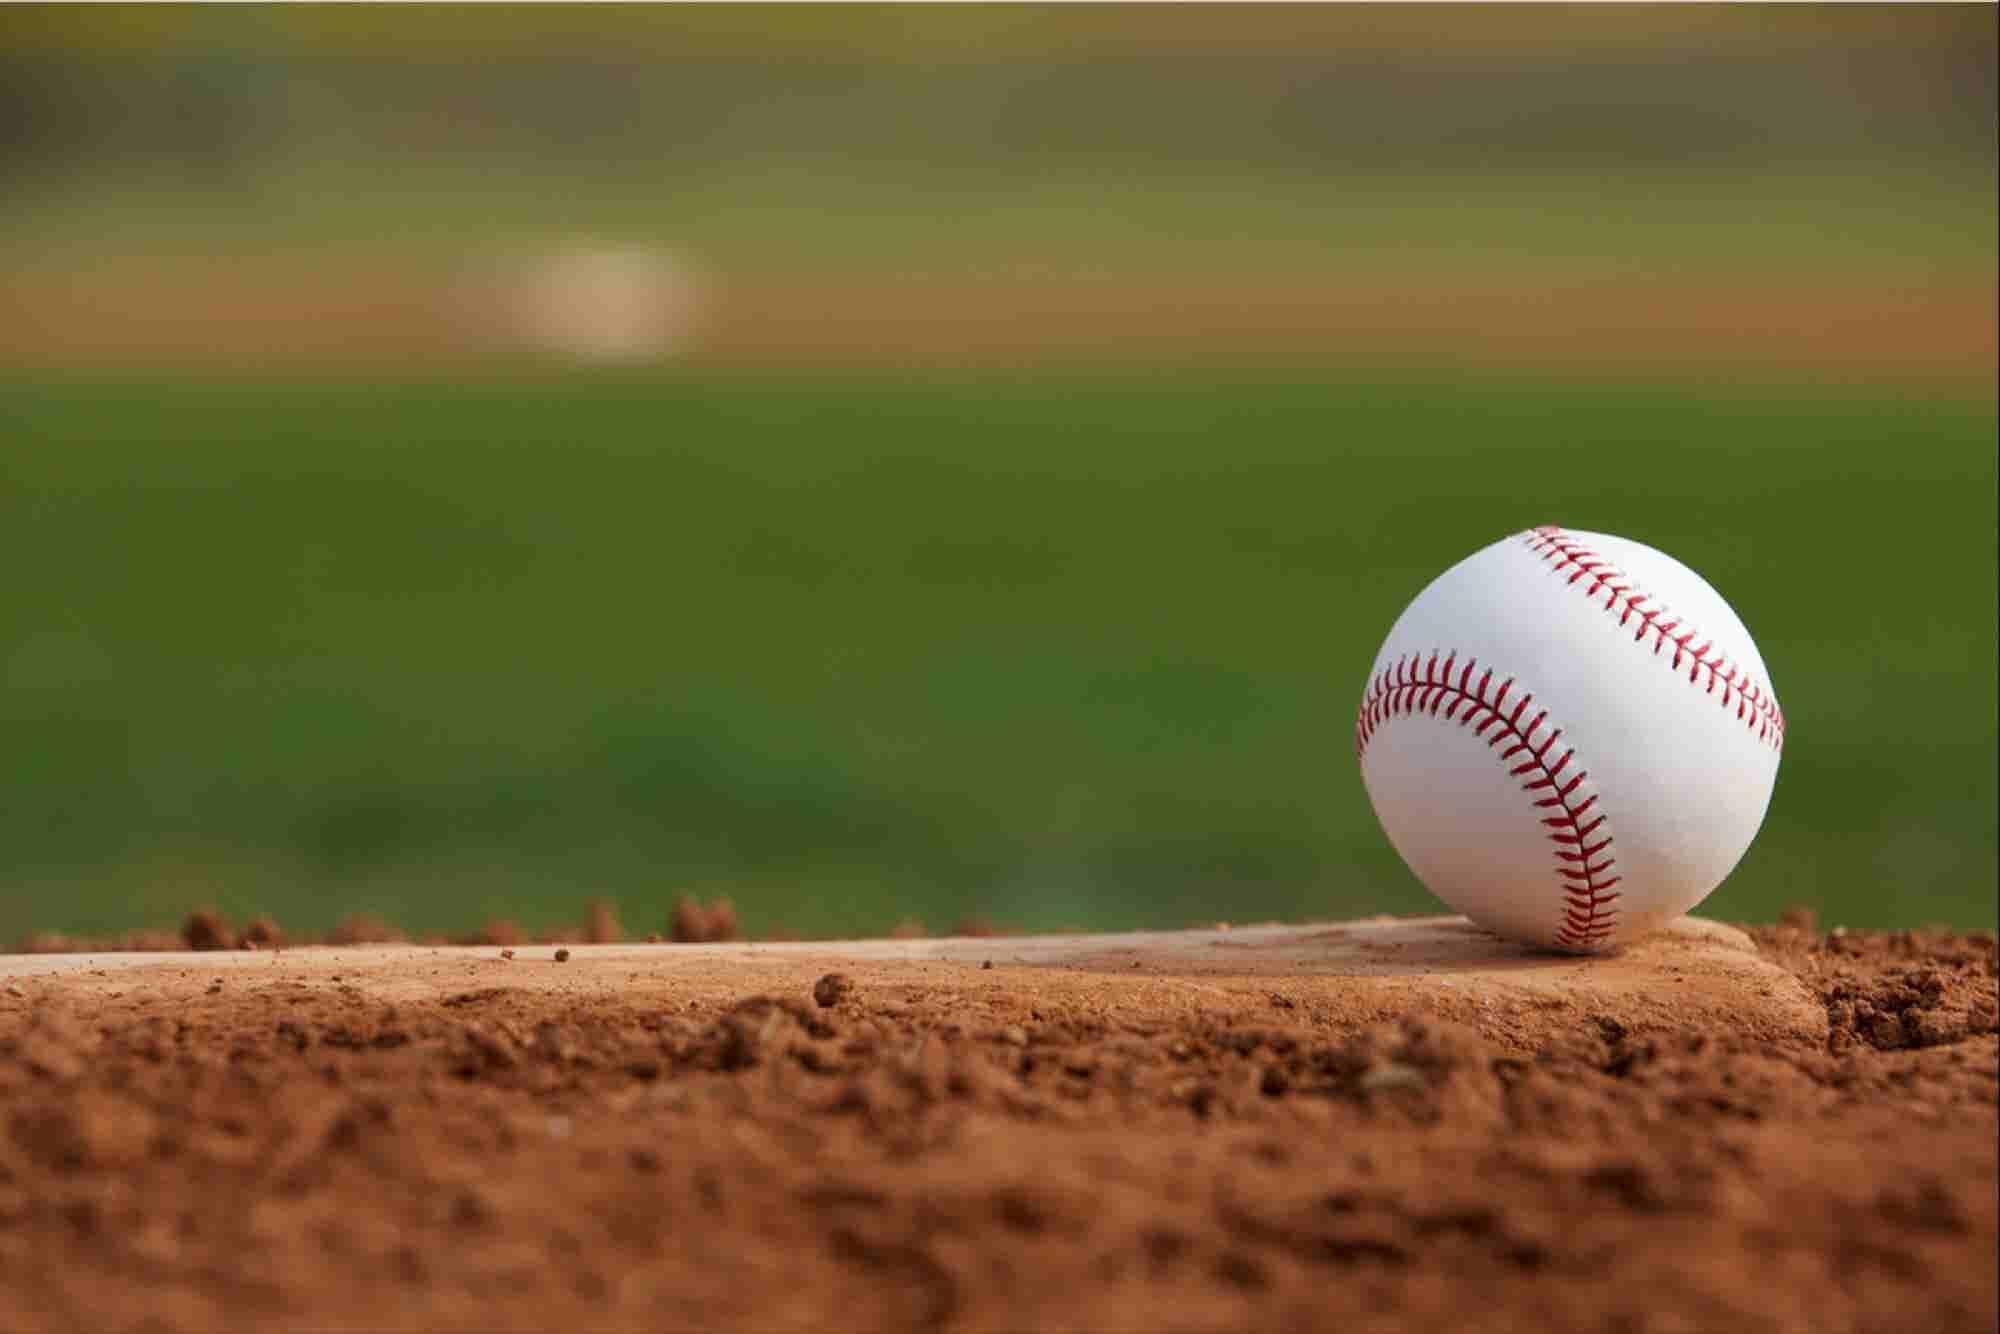 Roles to Run a Successful Adventure Sports Company